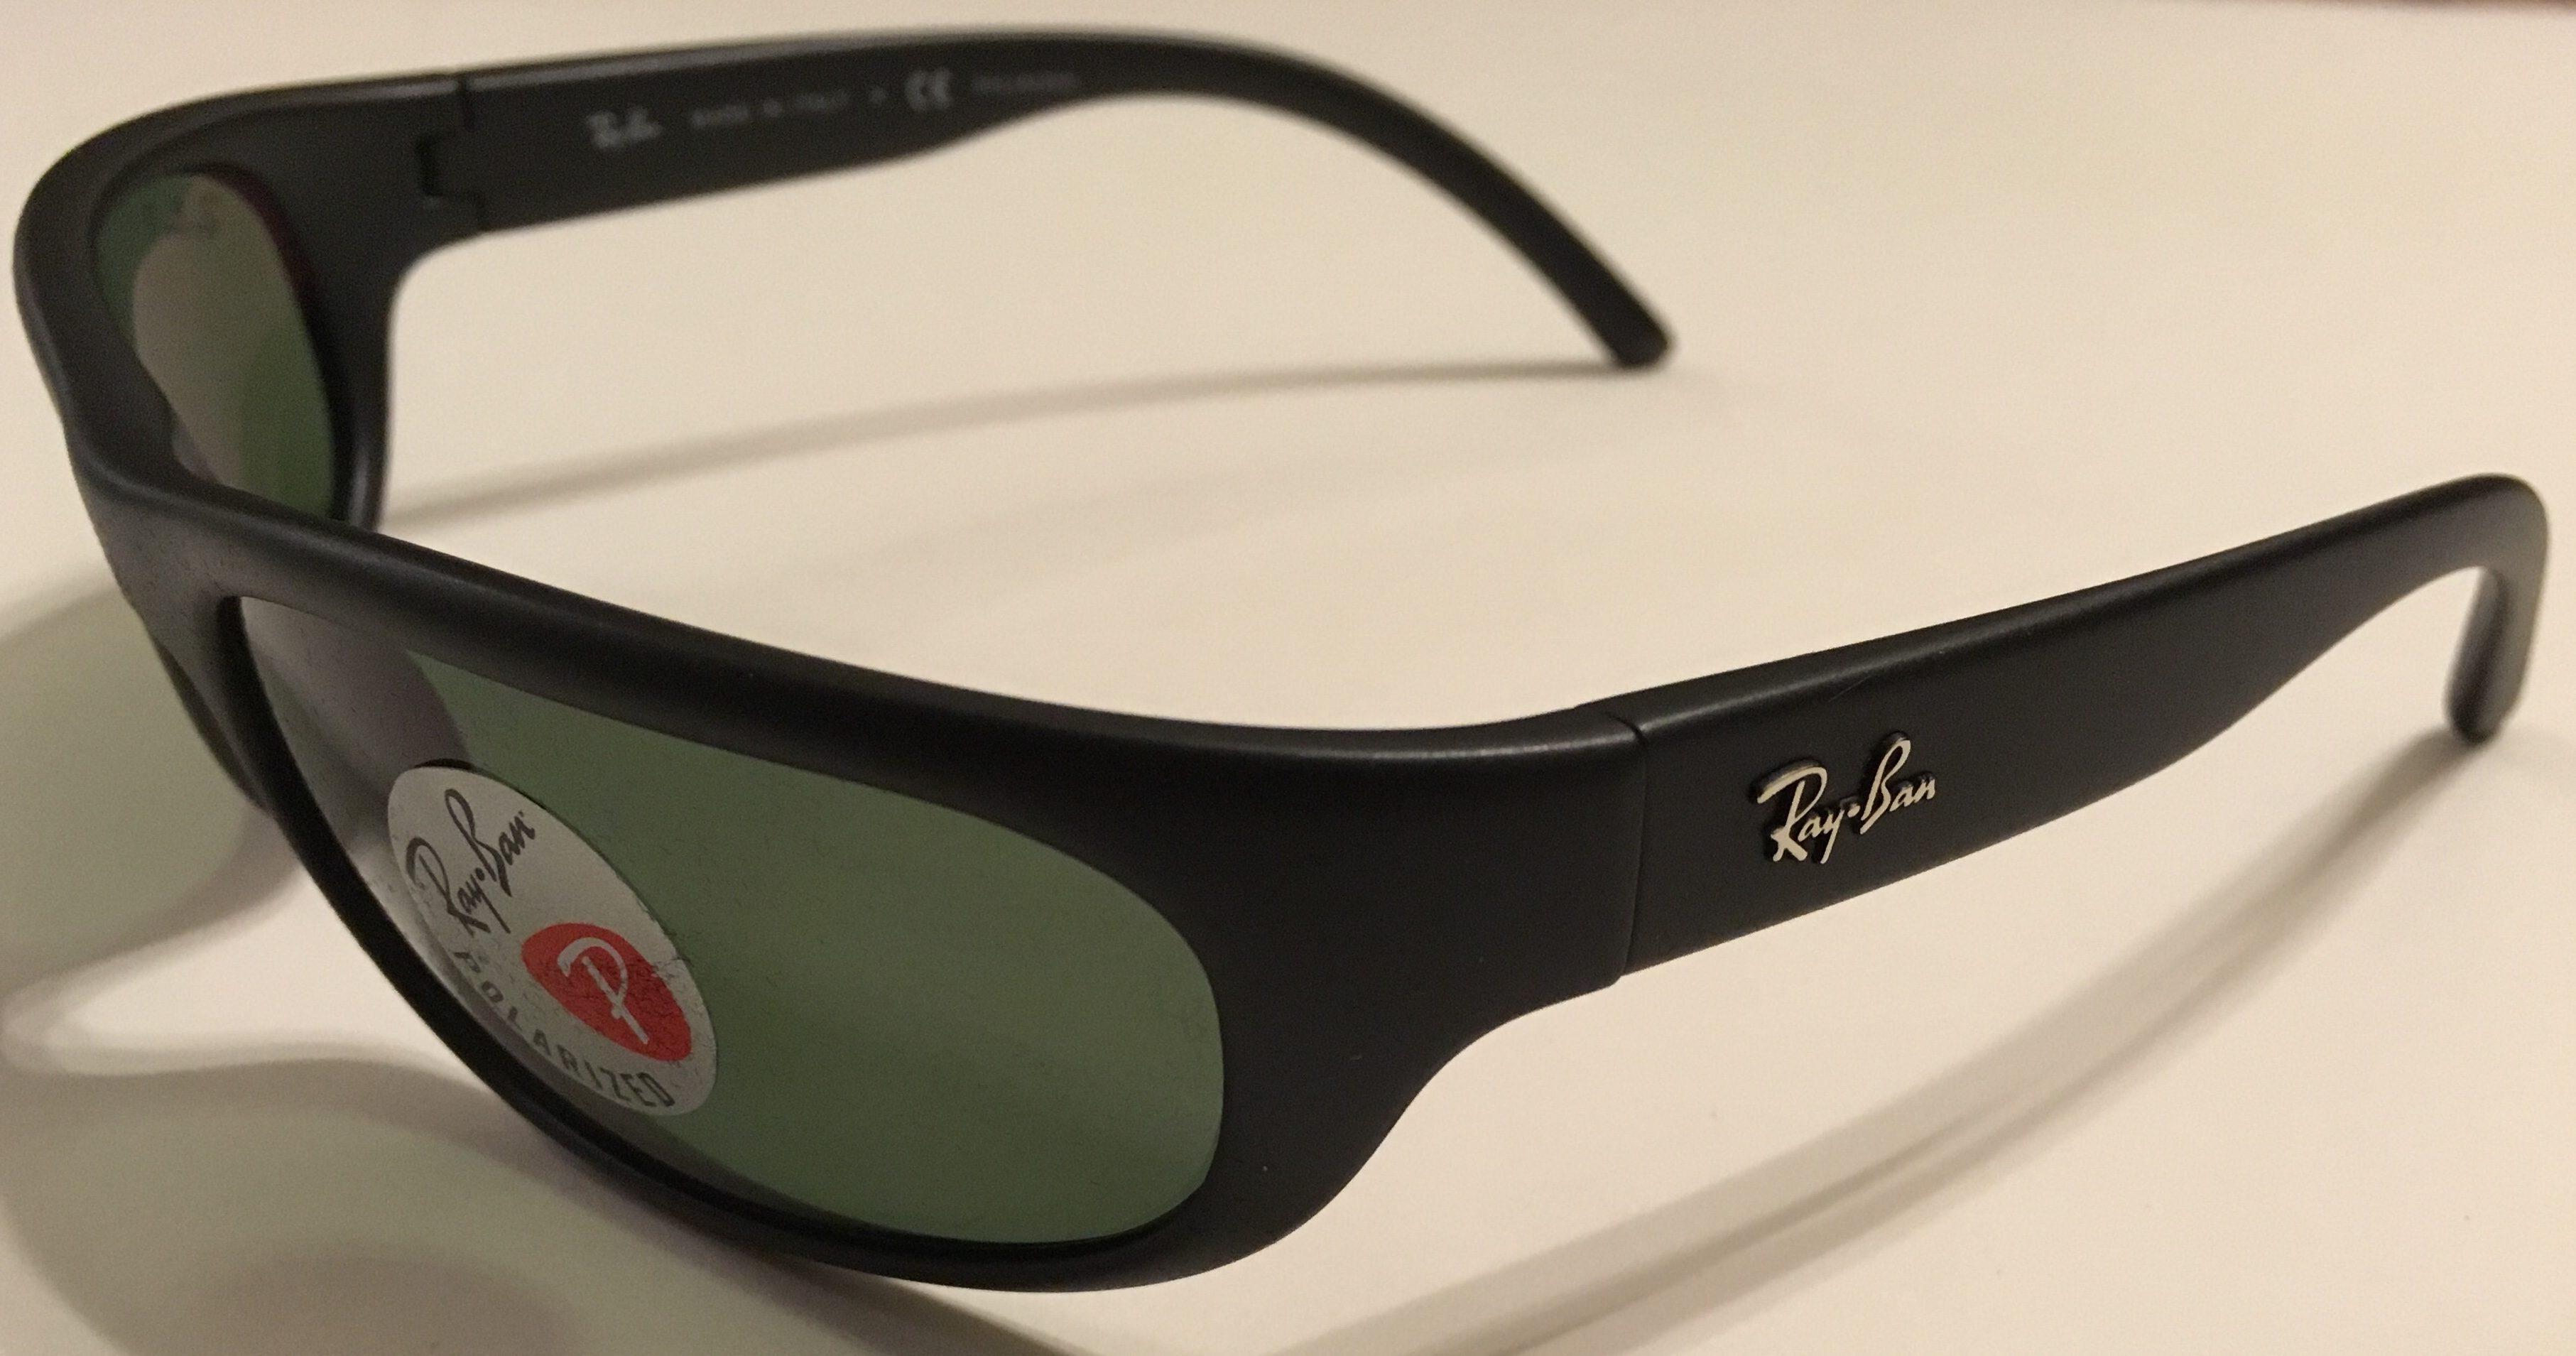 Ray Ban Predator Sunglasses Black Frame Polarized G 15